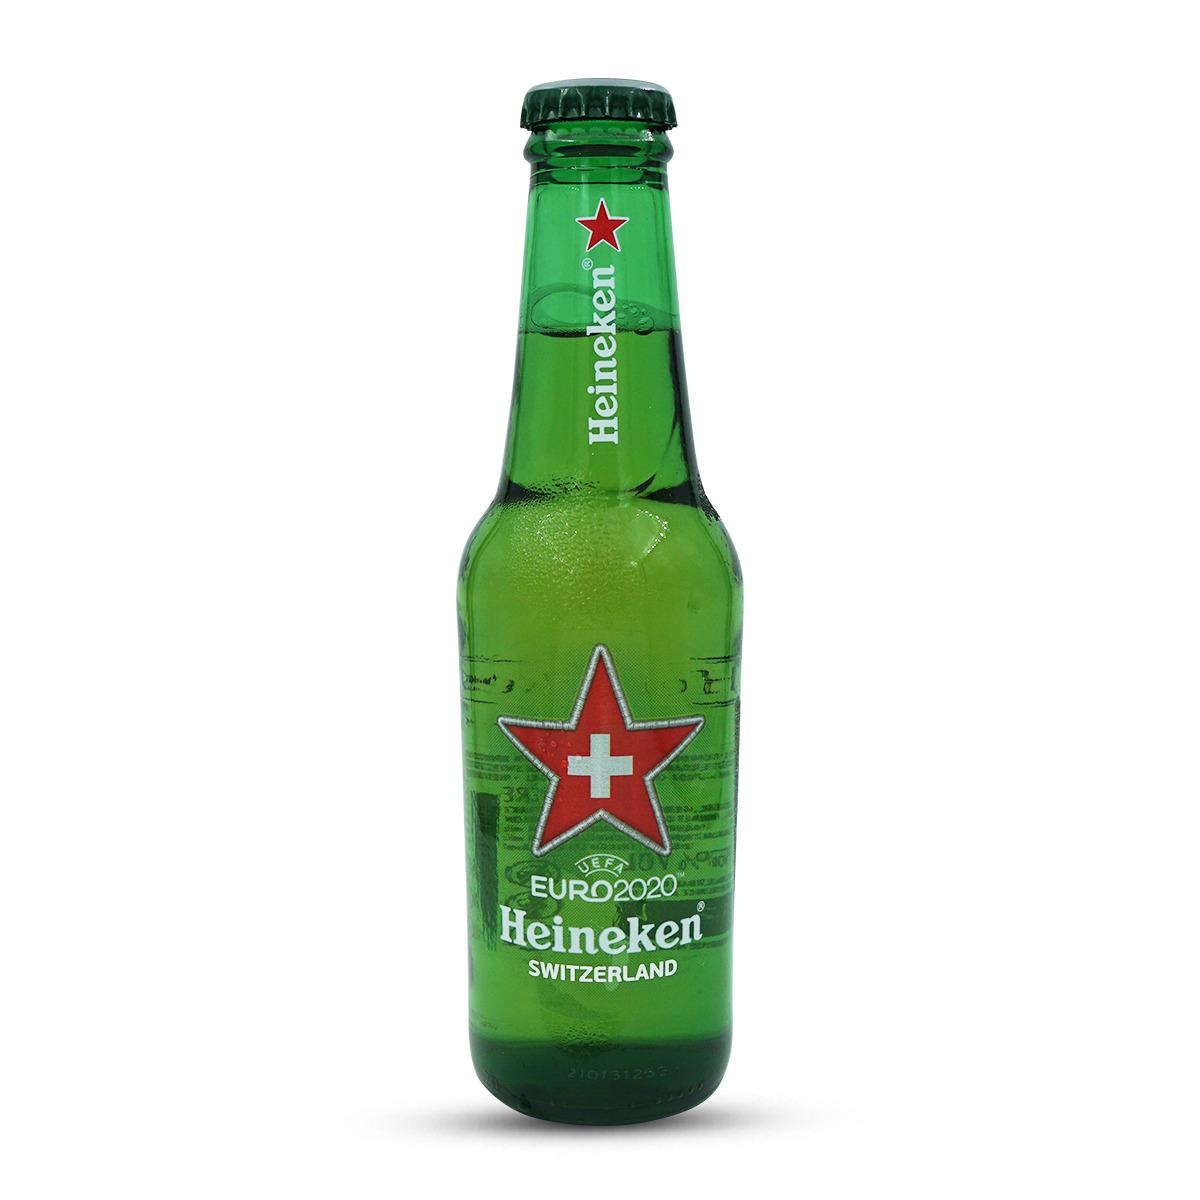 Heineken UEFA EURO 2020